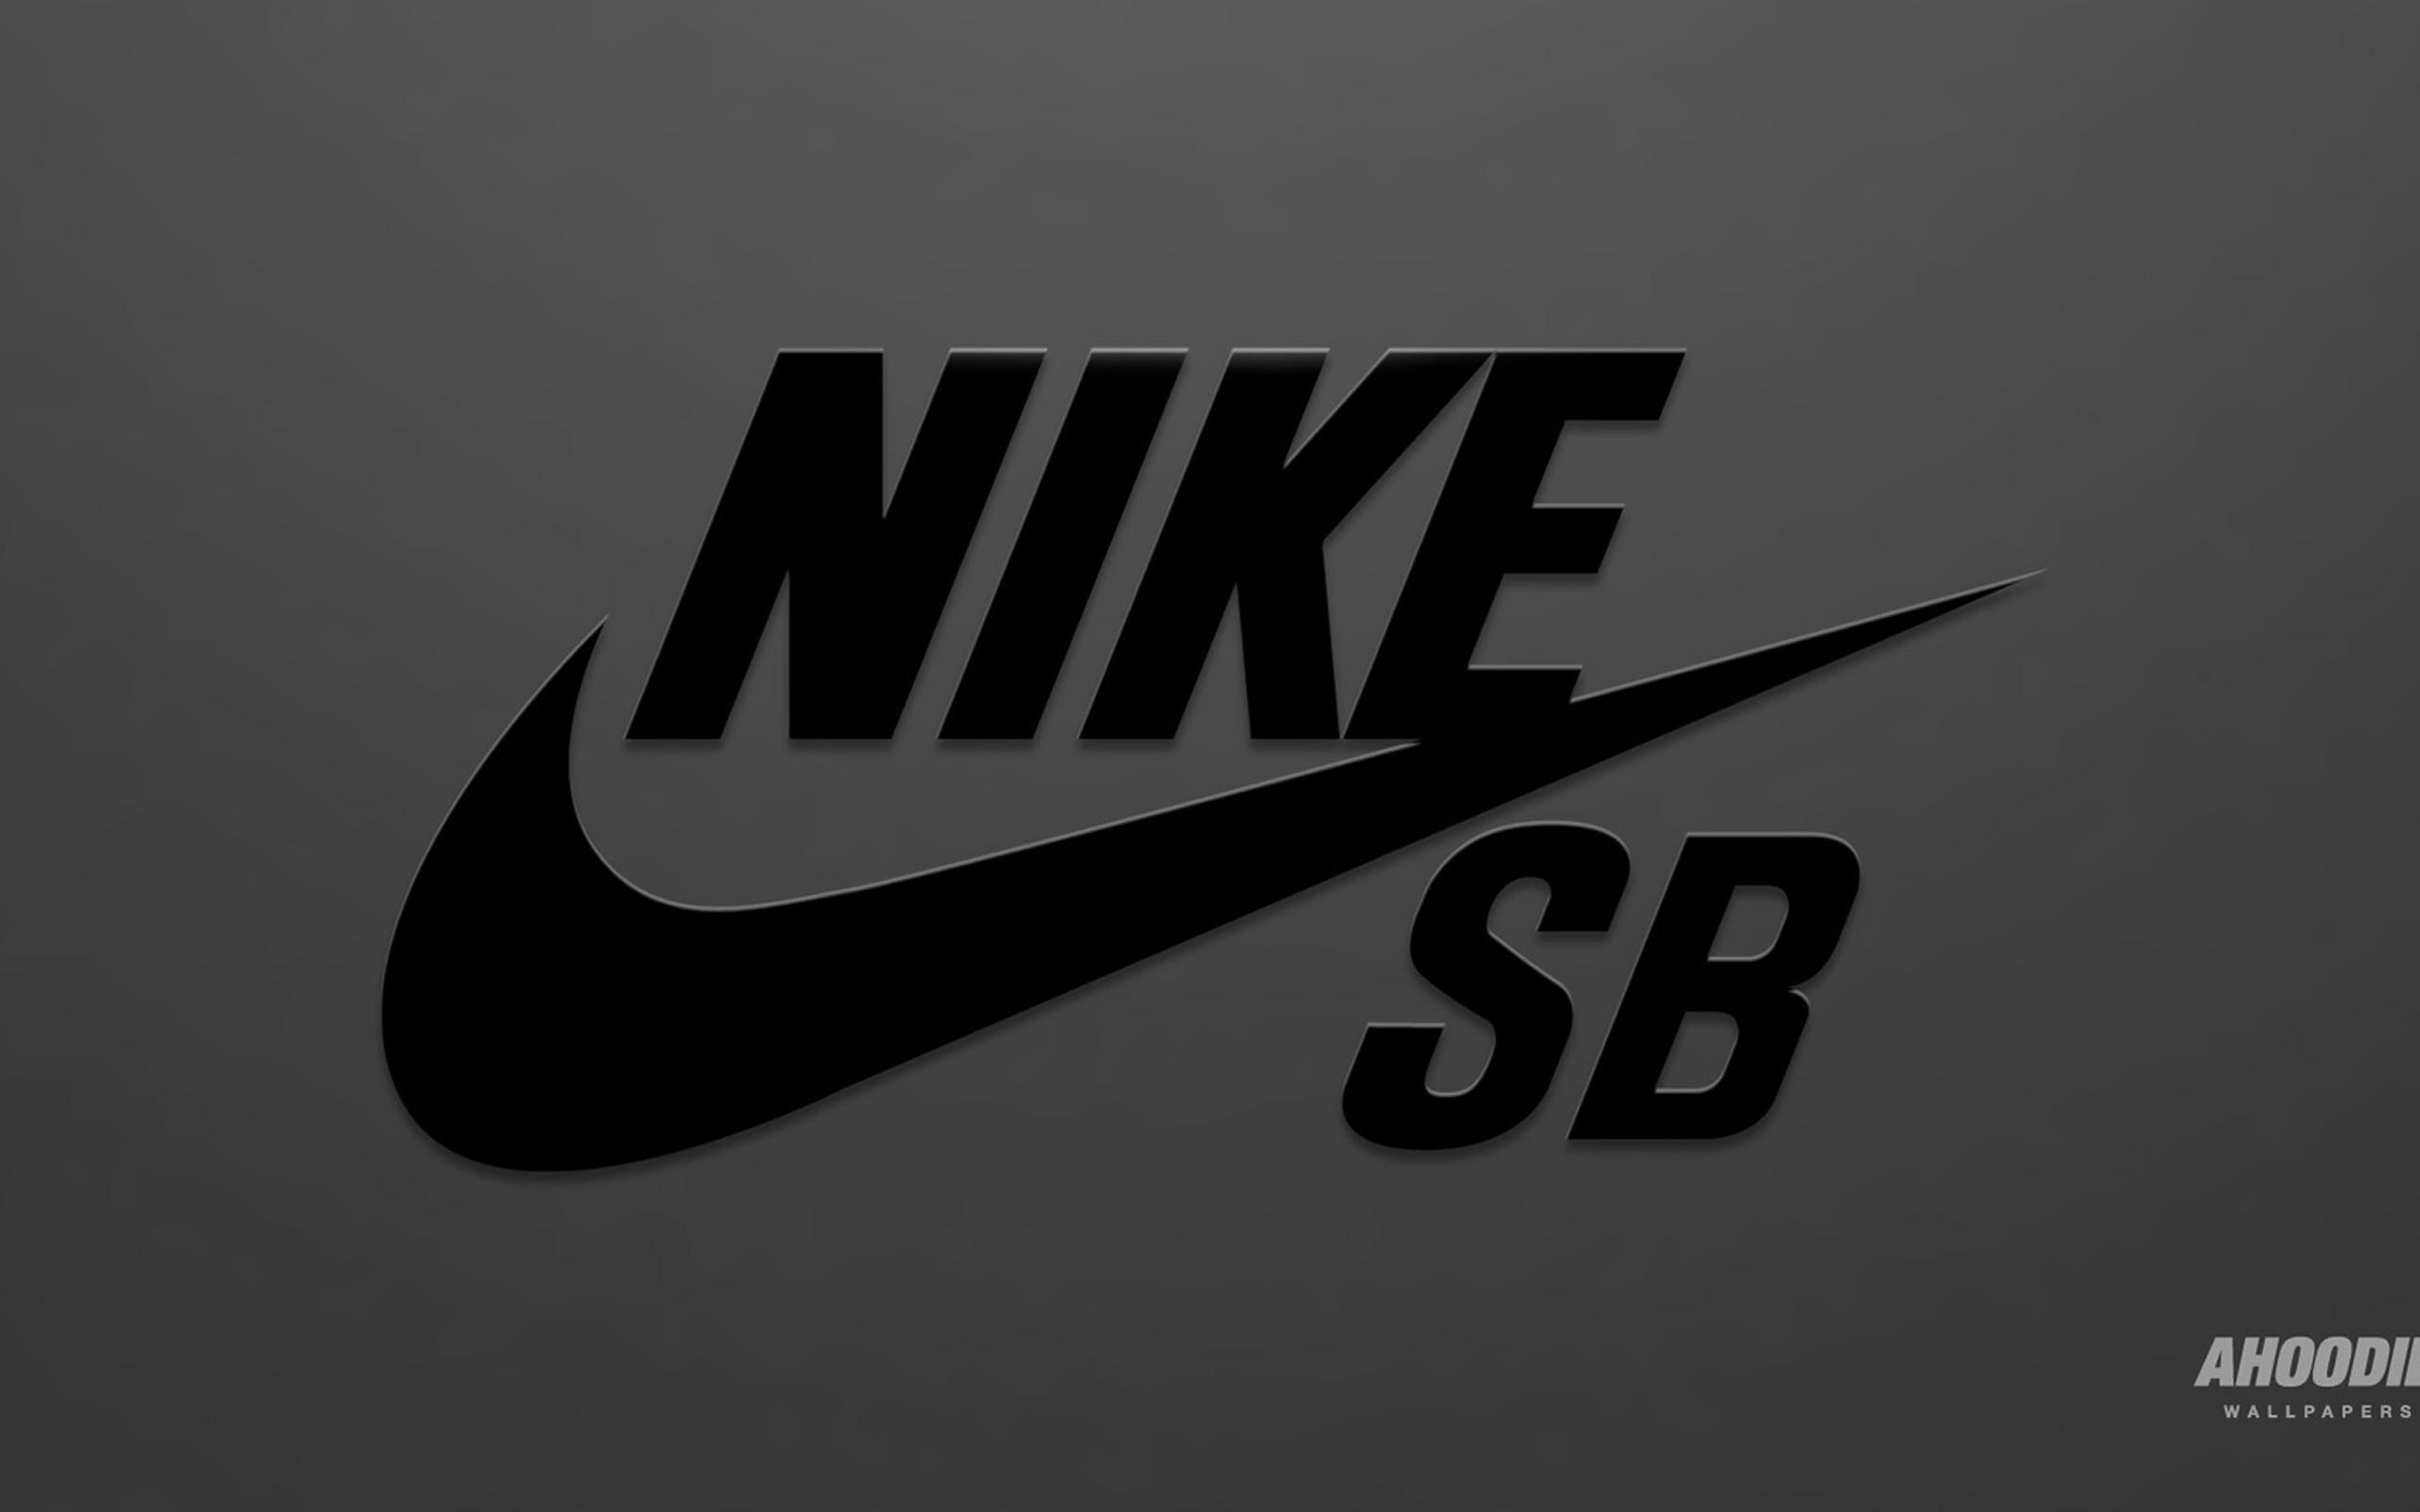 buy online 7d950 58fc4 2560x1600 Nike Sb Wallpapers HD X, jeep logo wallpaper iphone 5 -  JohnyWheels